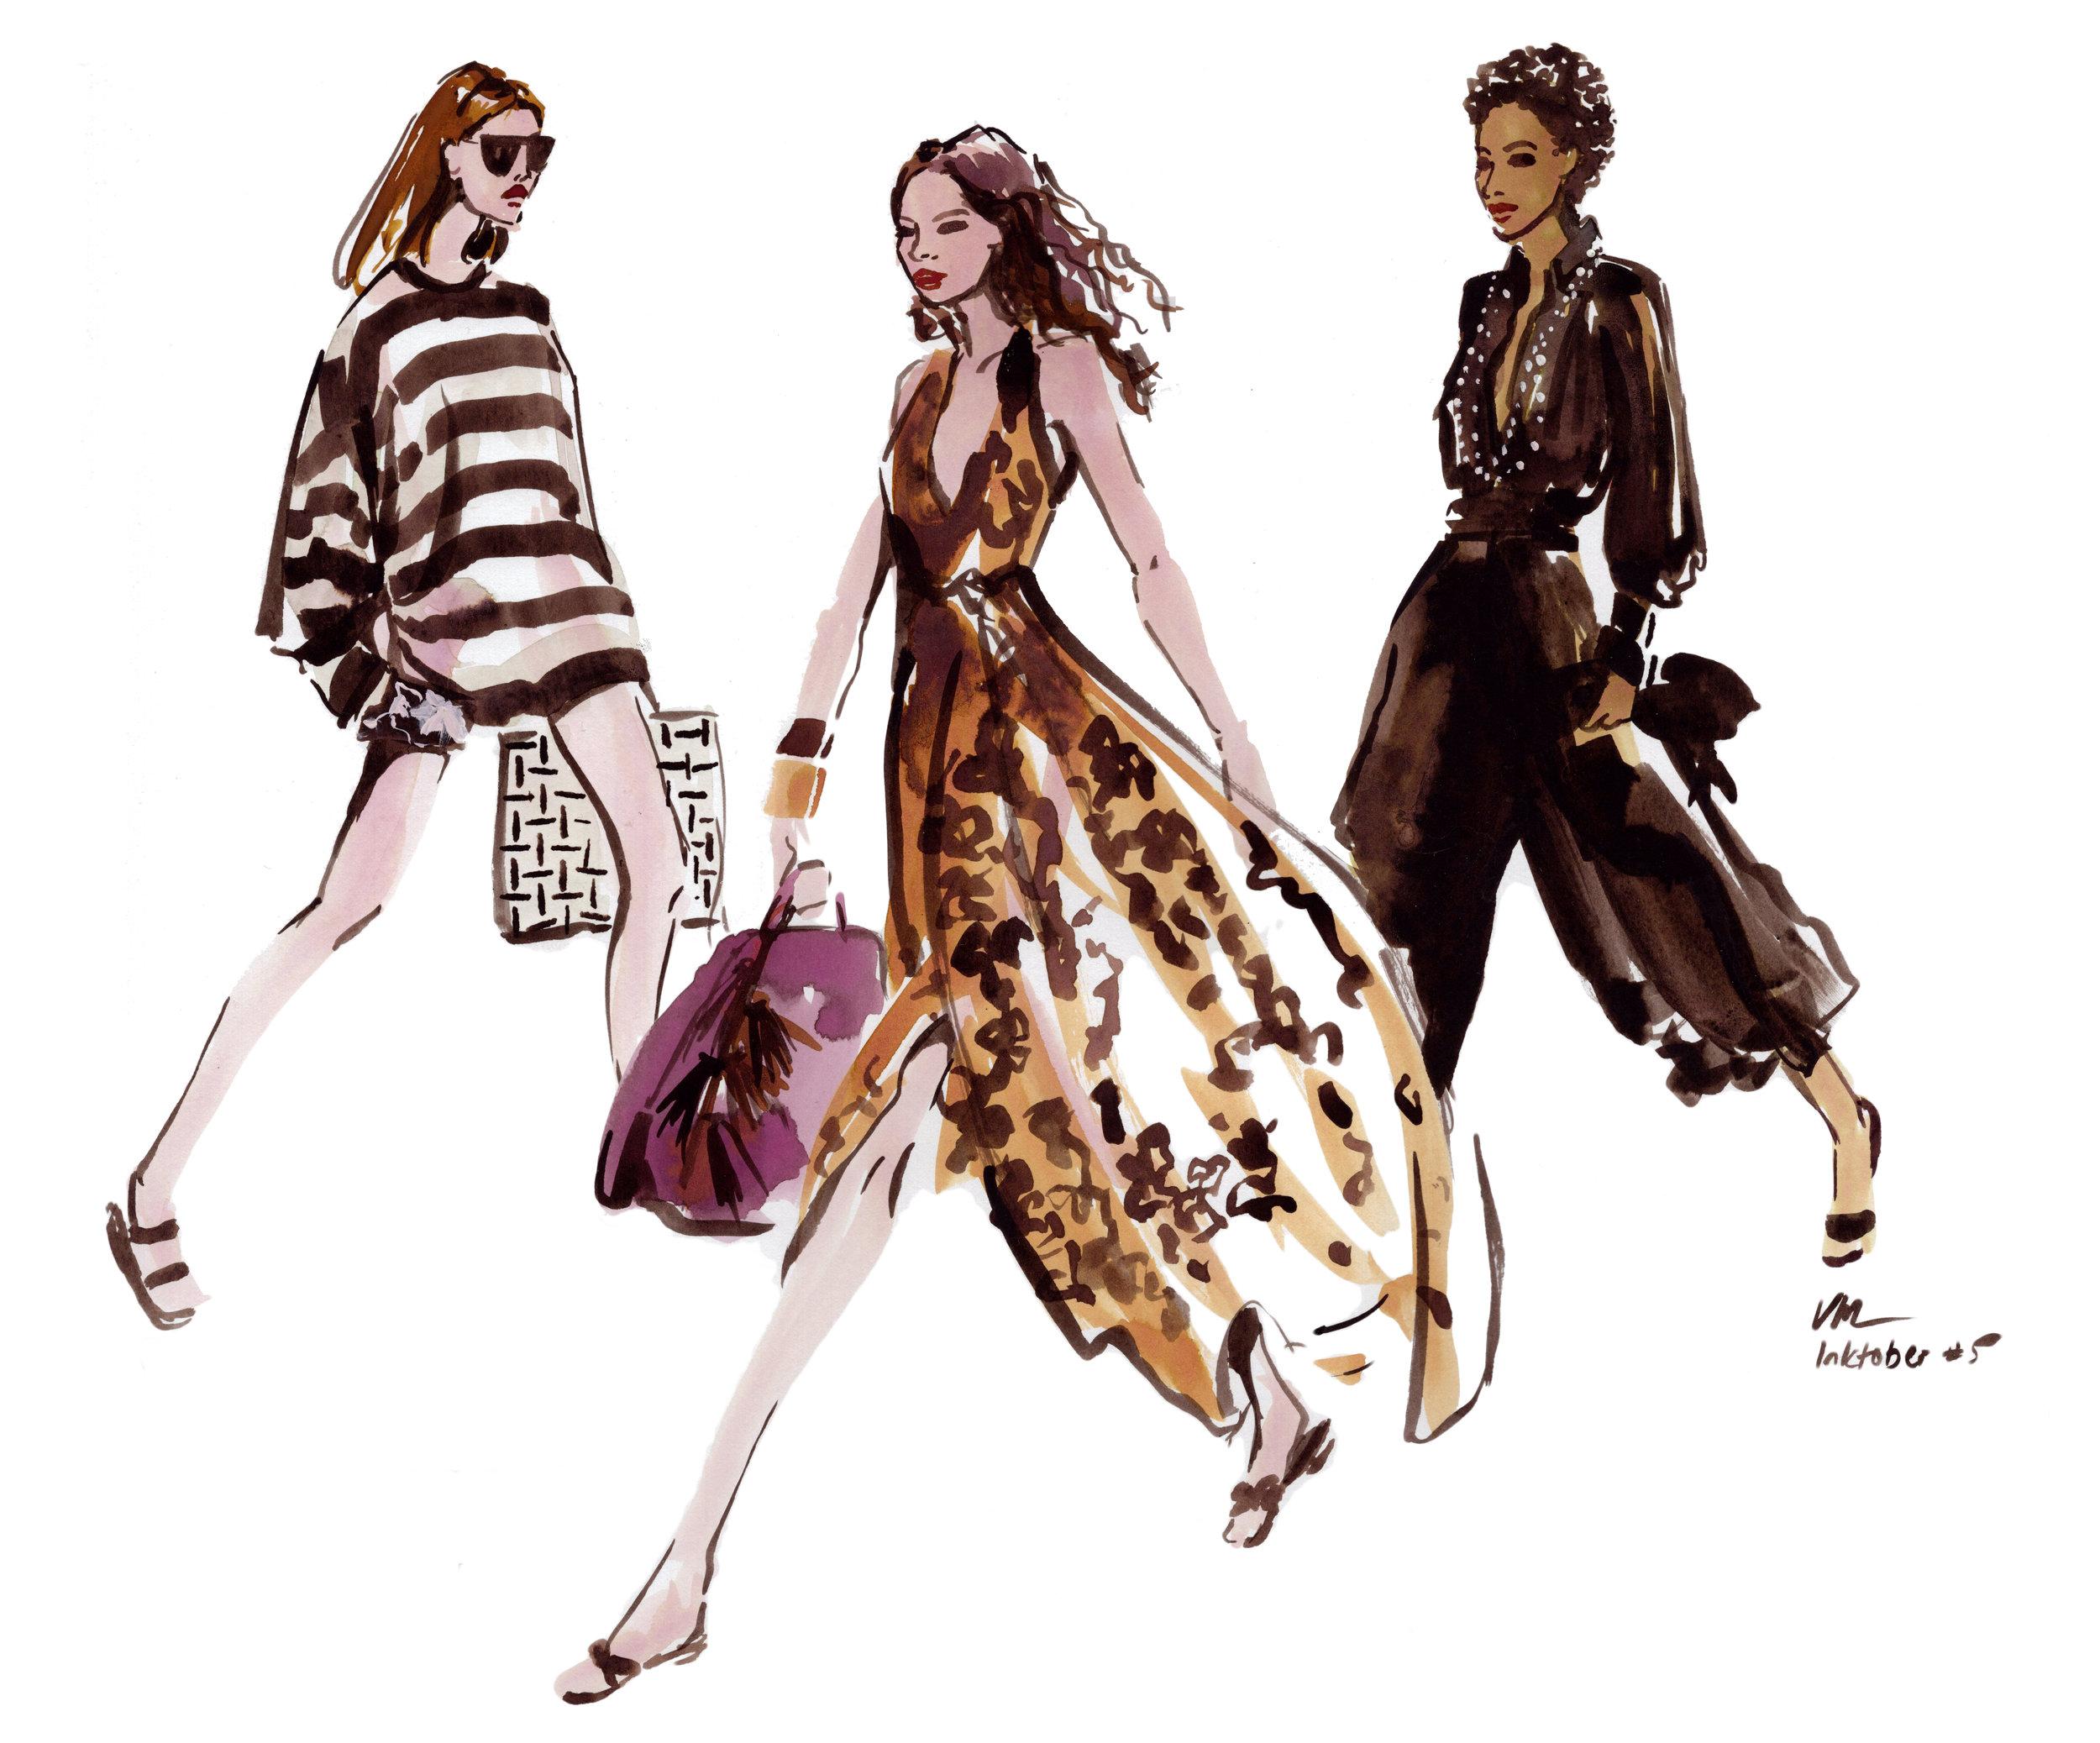 Fashion Illustration by Veronica Miller Jamison, Veronica Jamison Art